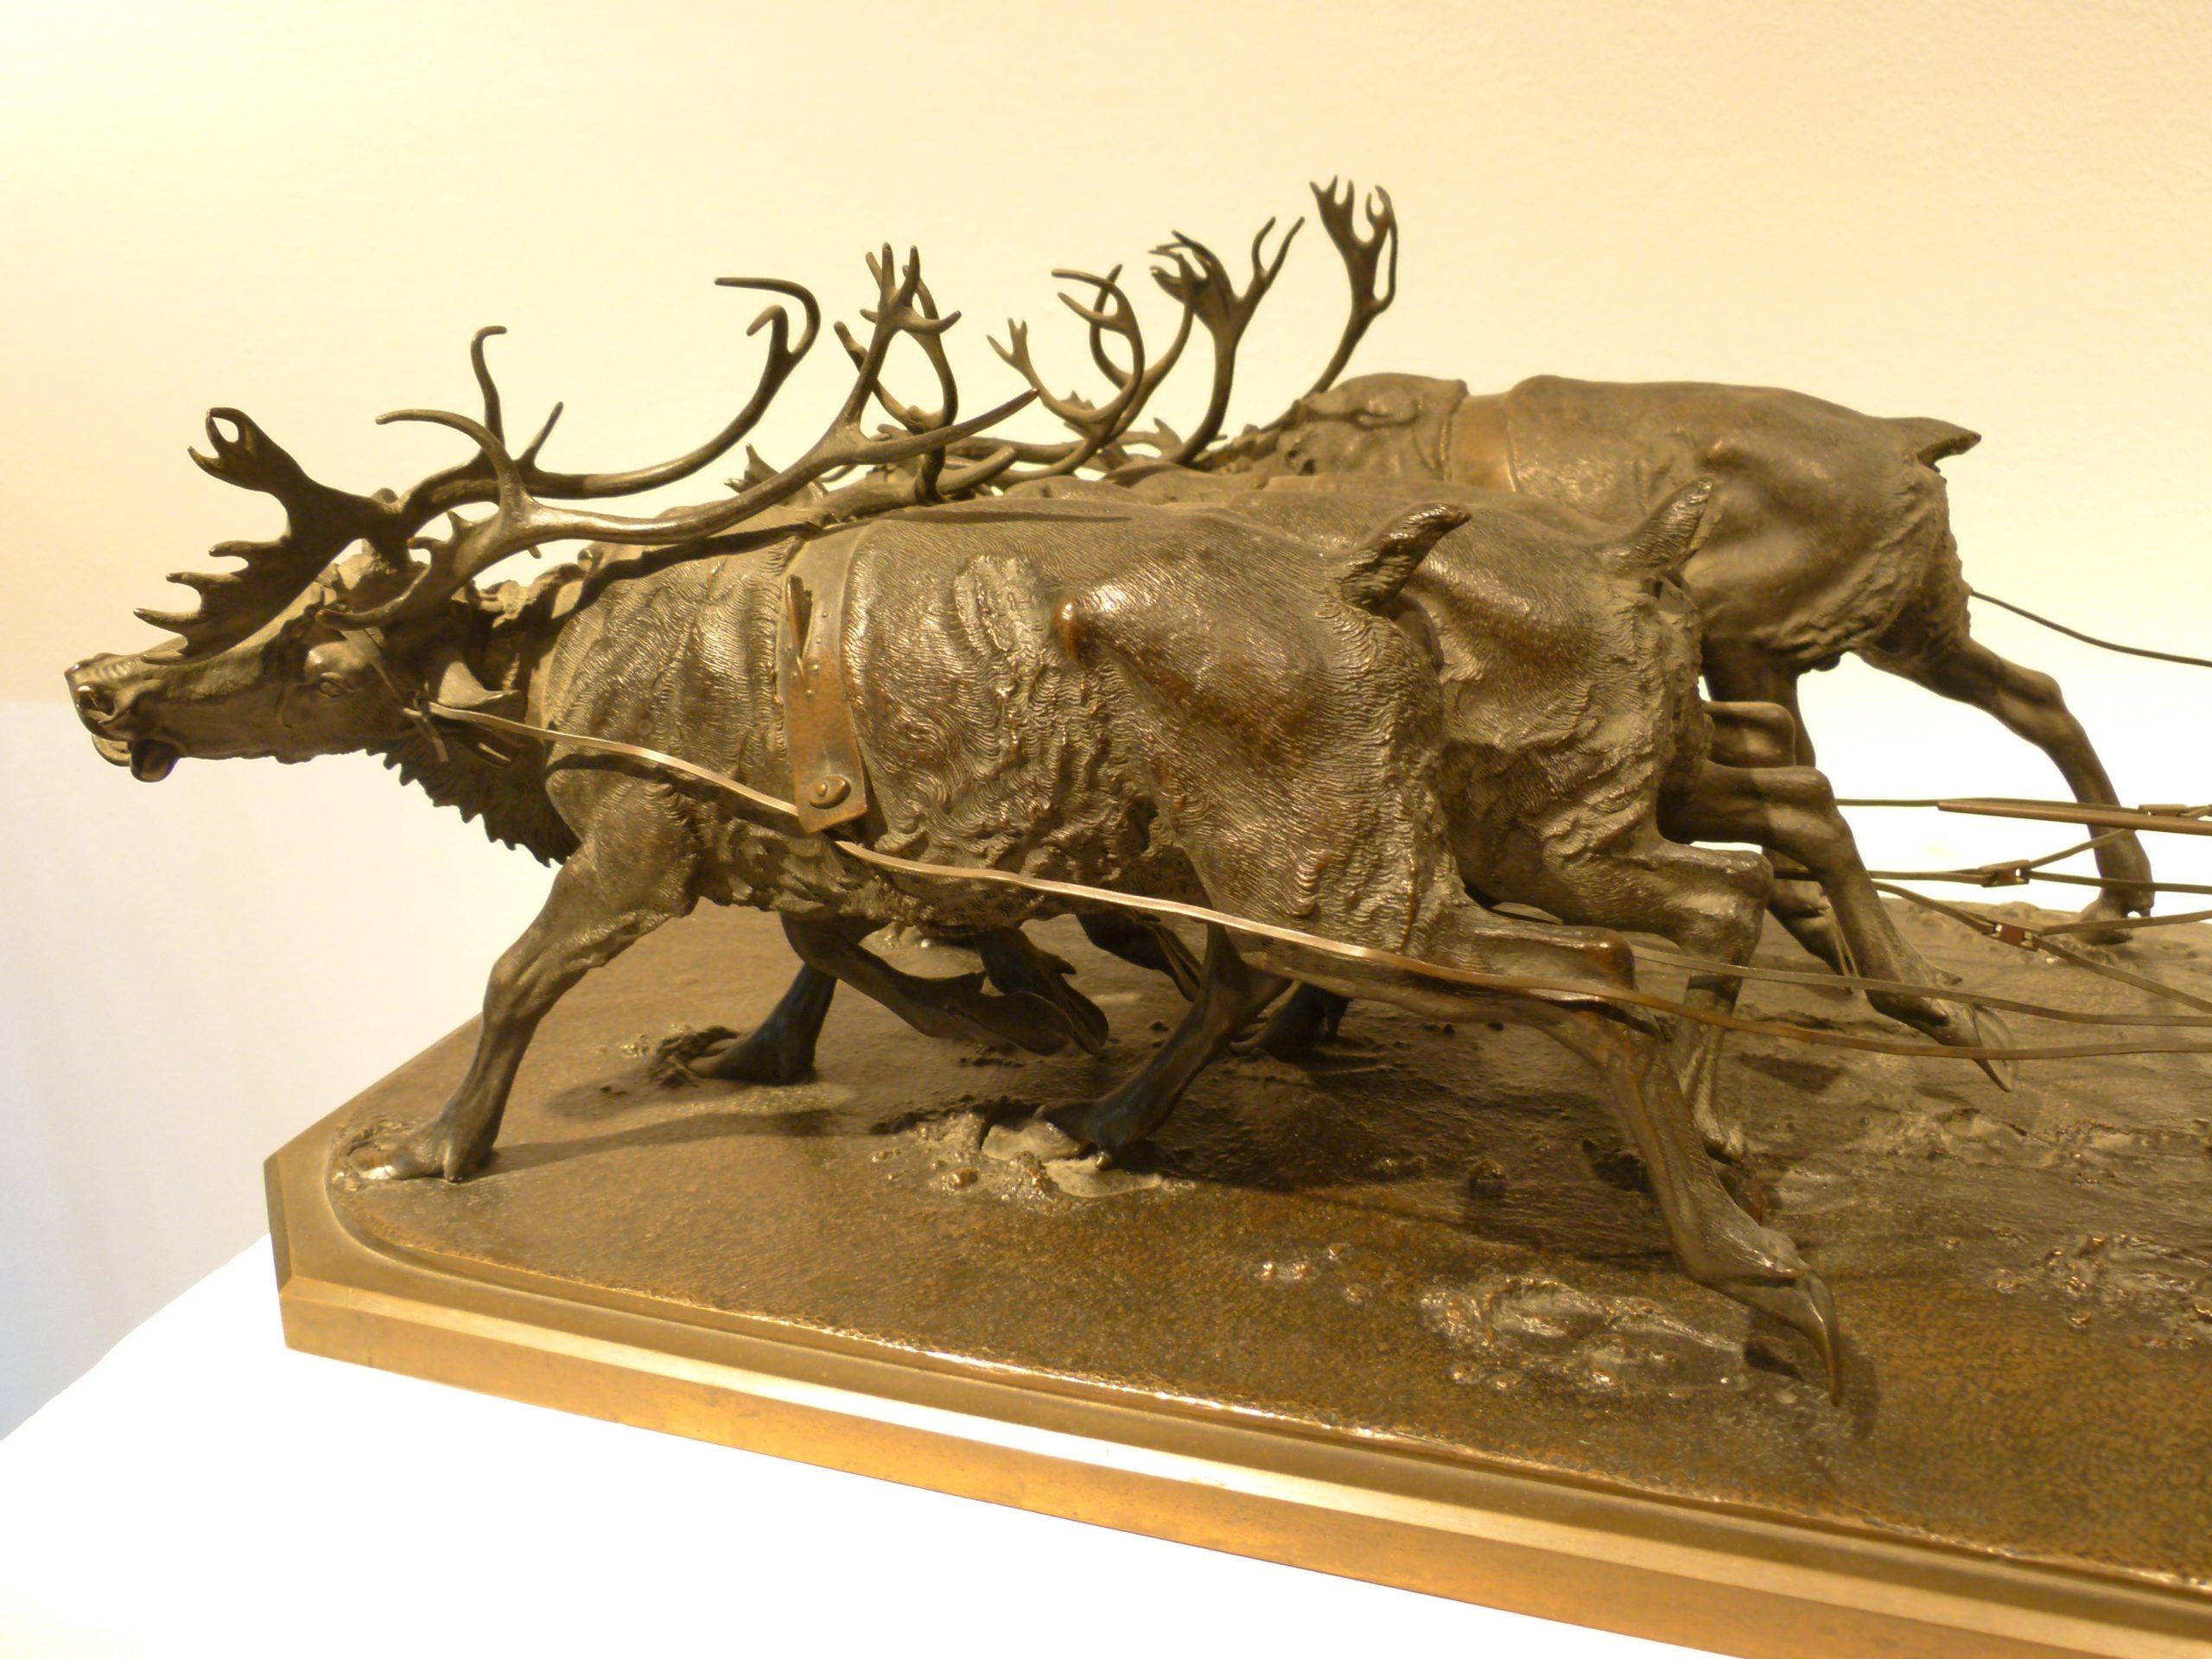 nikolay-ivanovivh-leiberich - russian-lieberich-ivanovich-bronze-four-stugs-statue-russian-marking